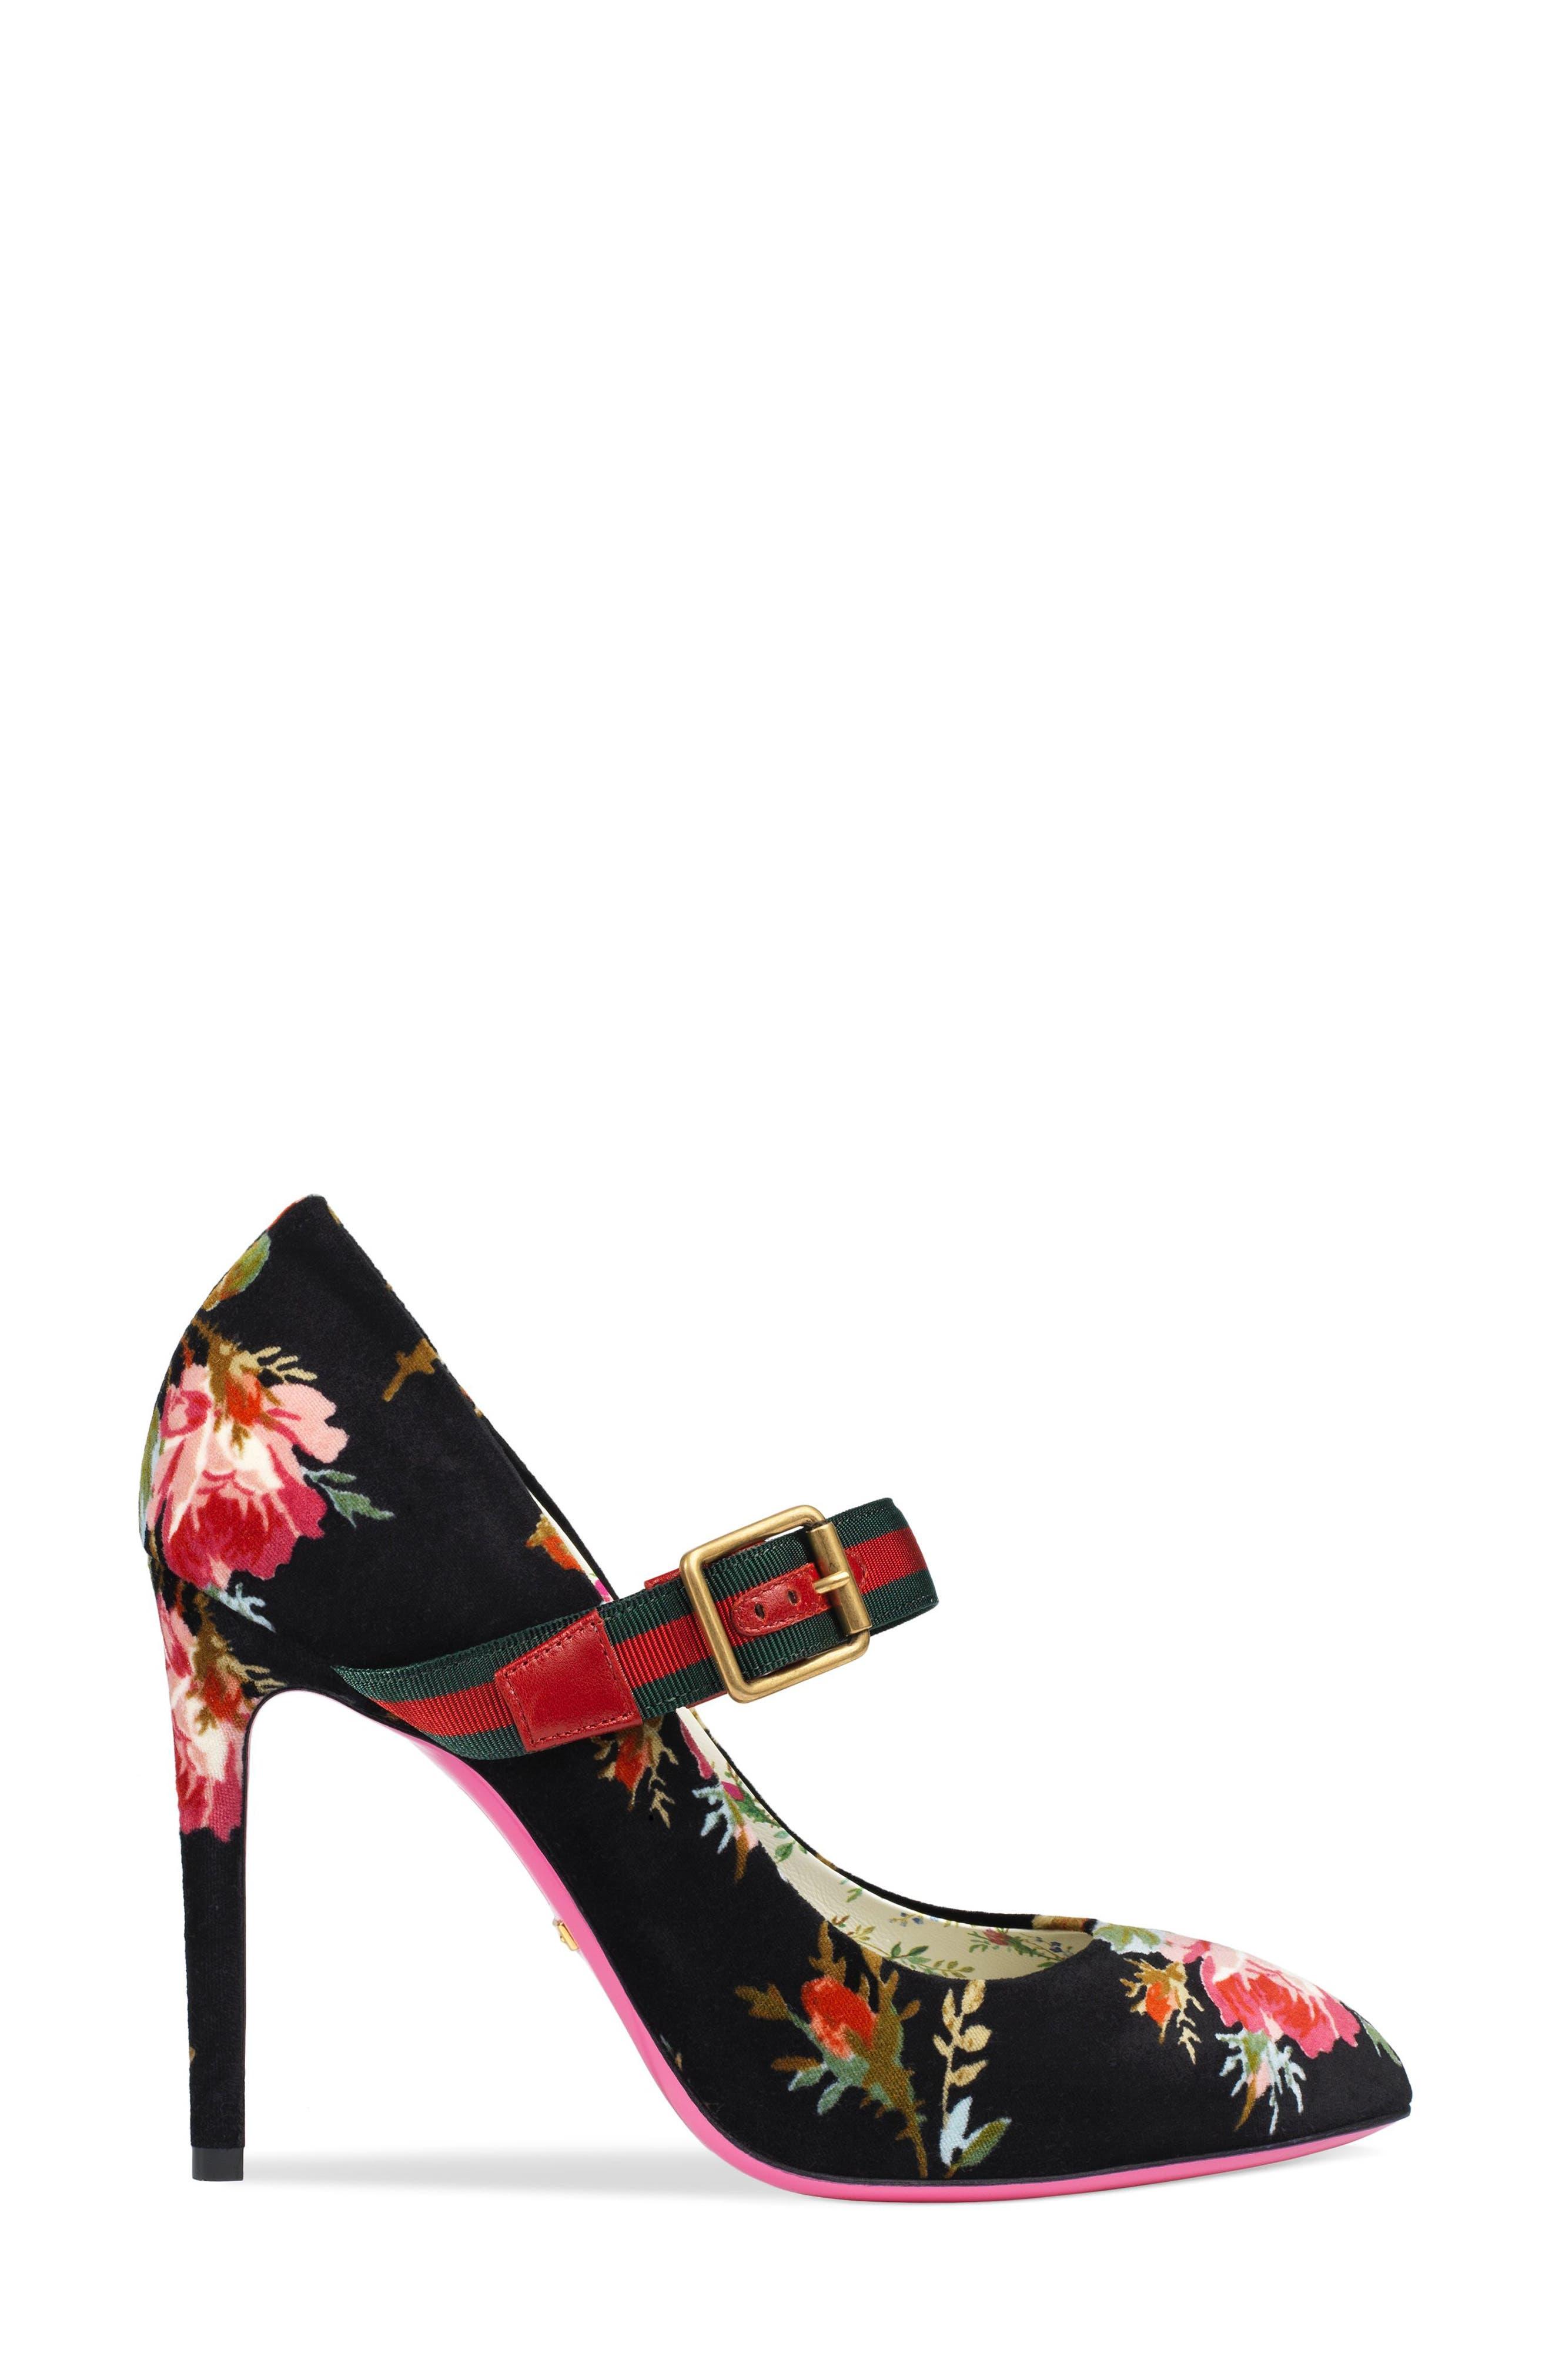 b742b3cf3eb Gucci Women s Pumps Shoes